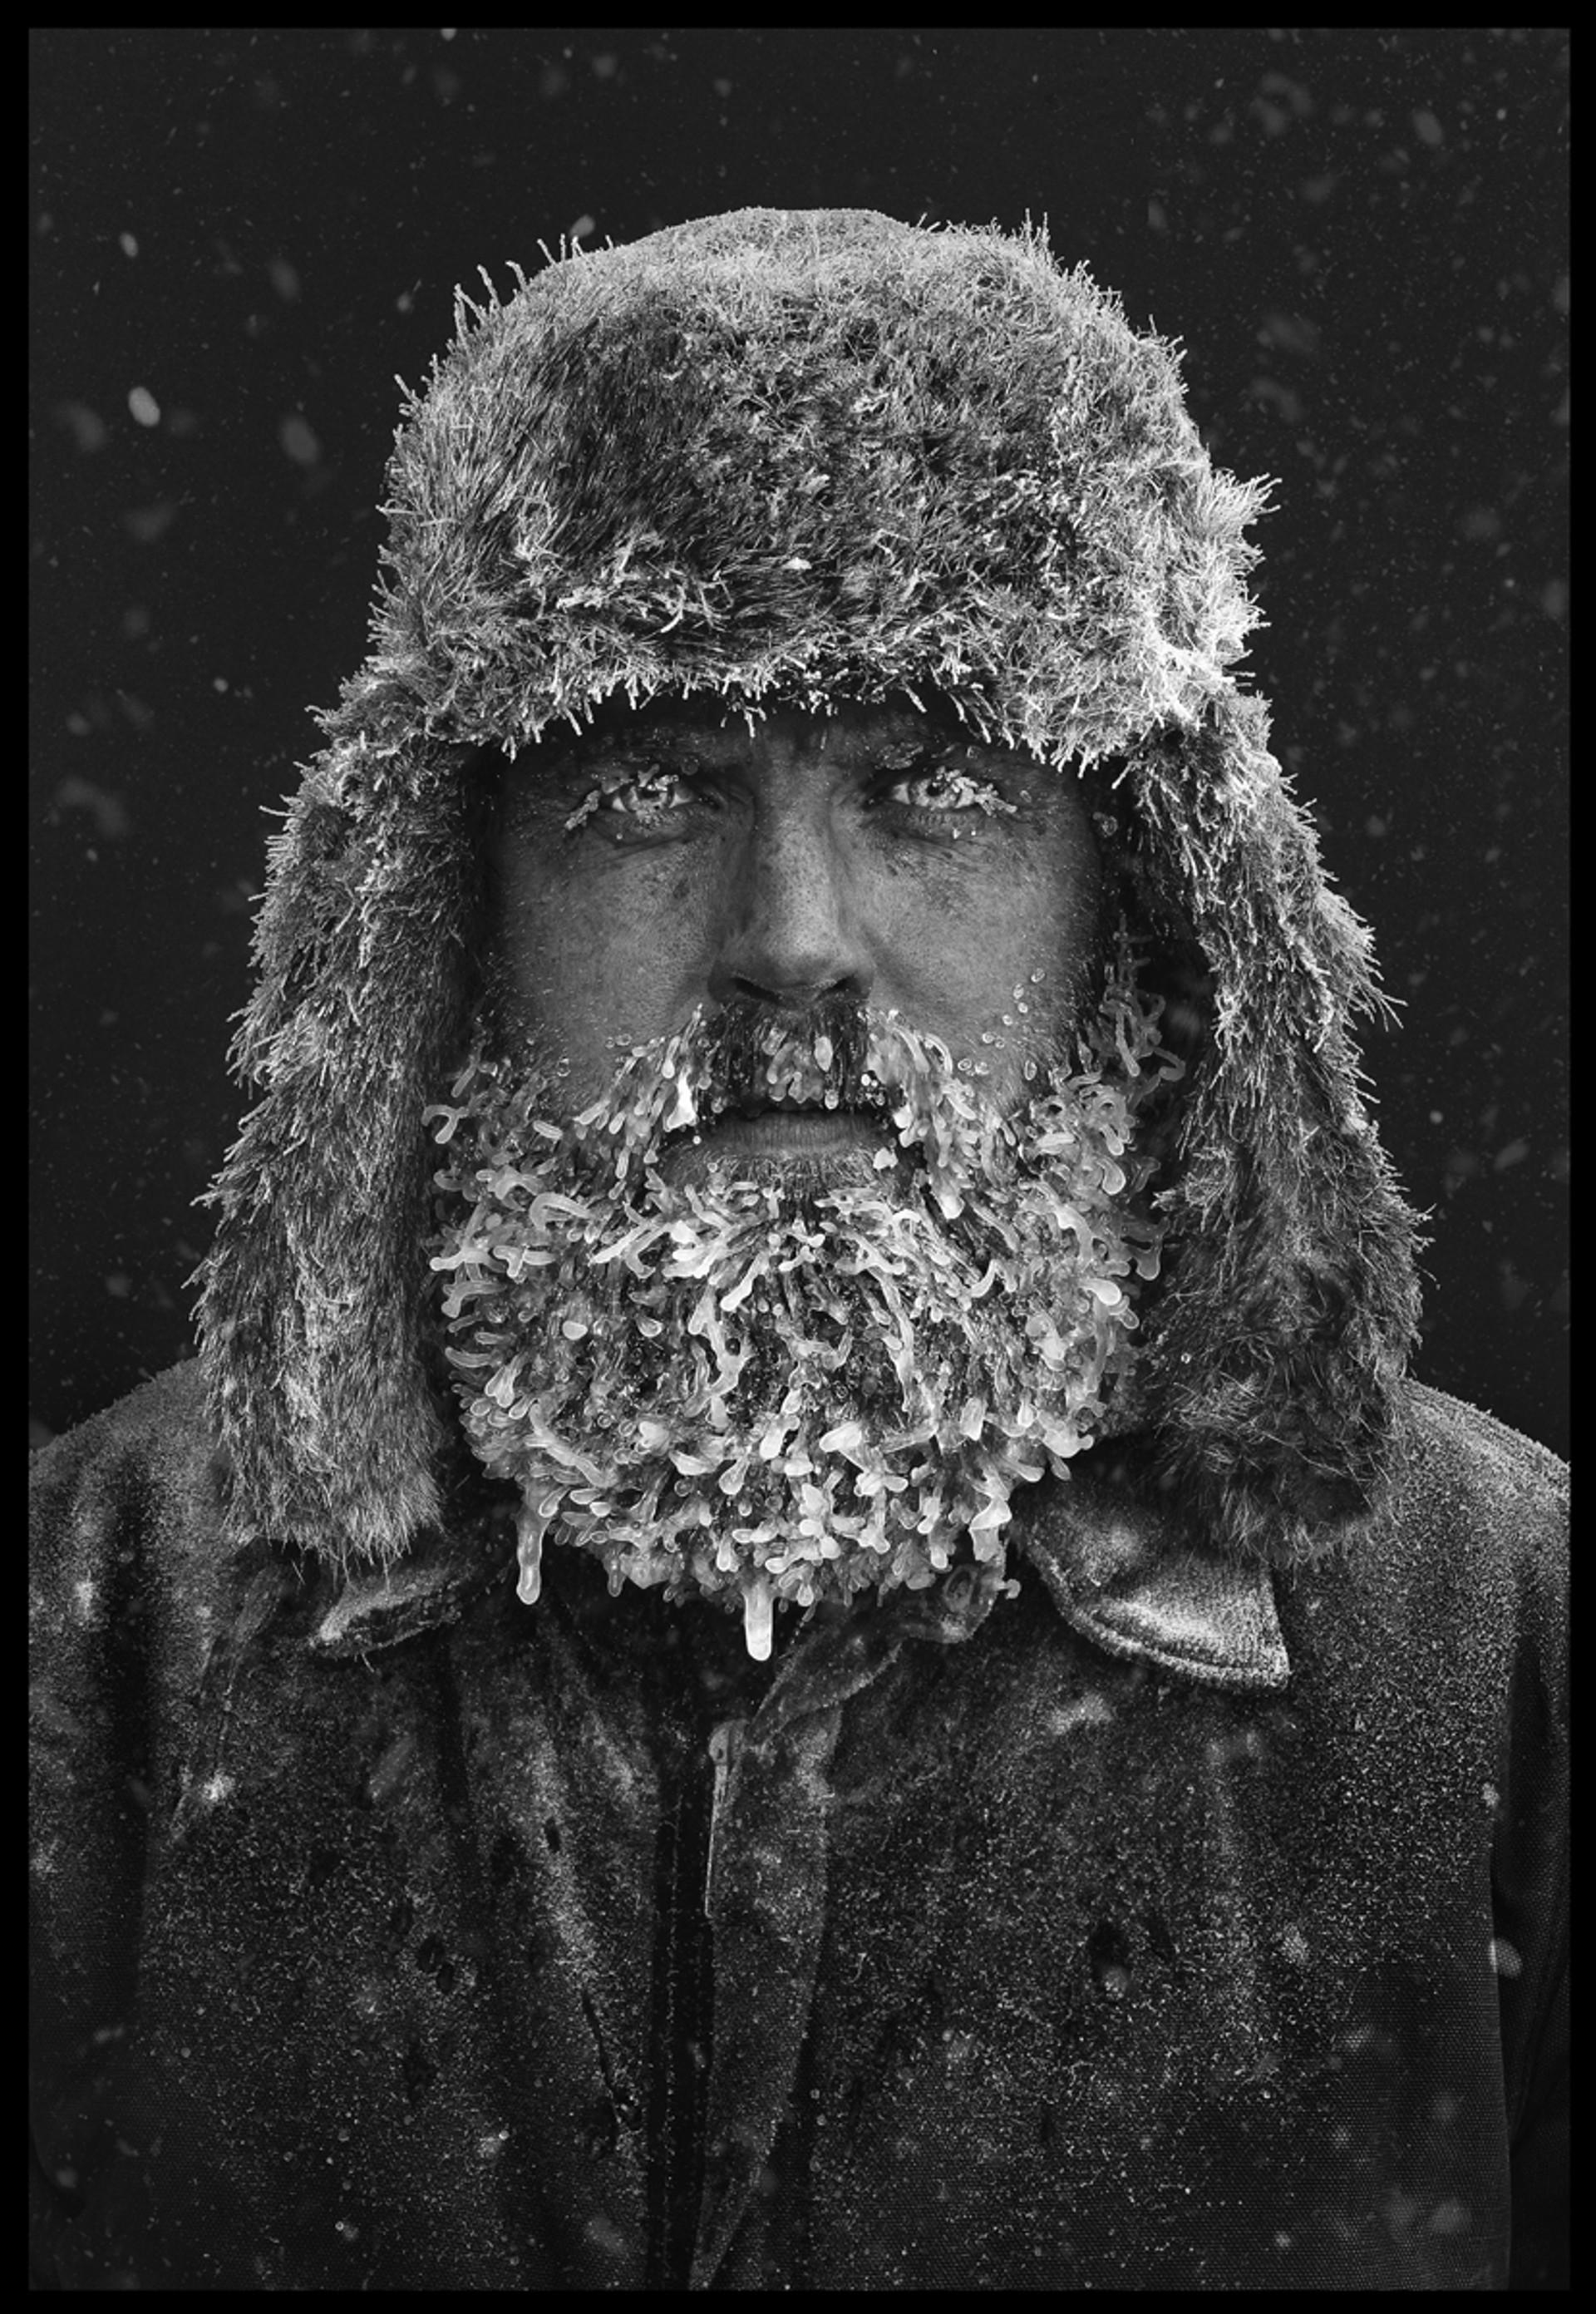 Expedition (Iceman) AP by Allan Bailey